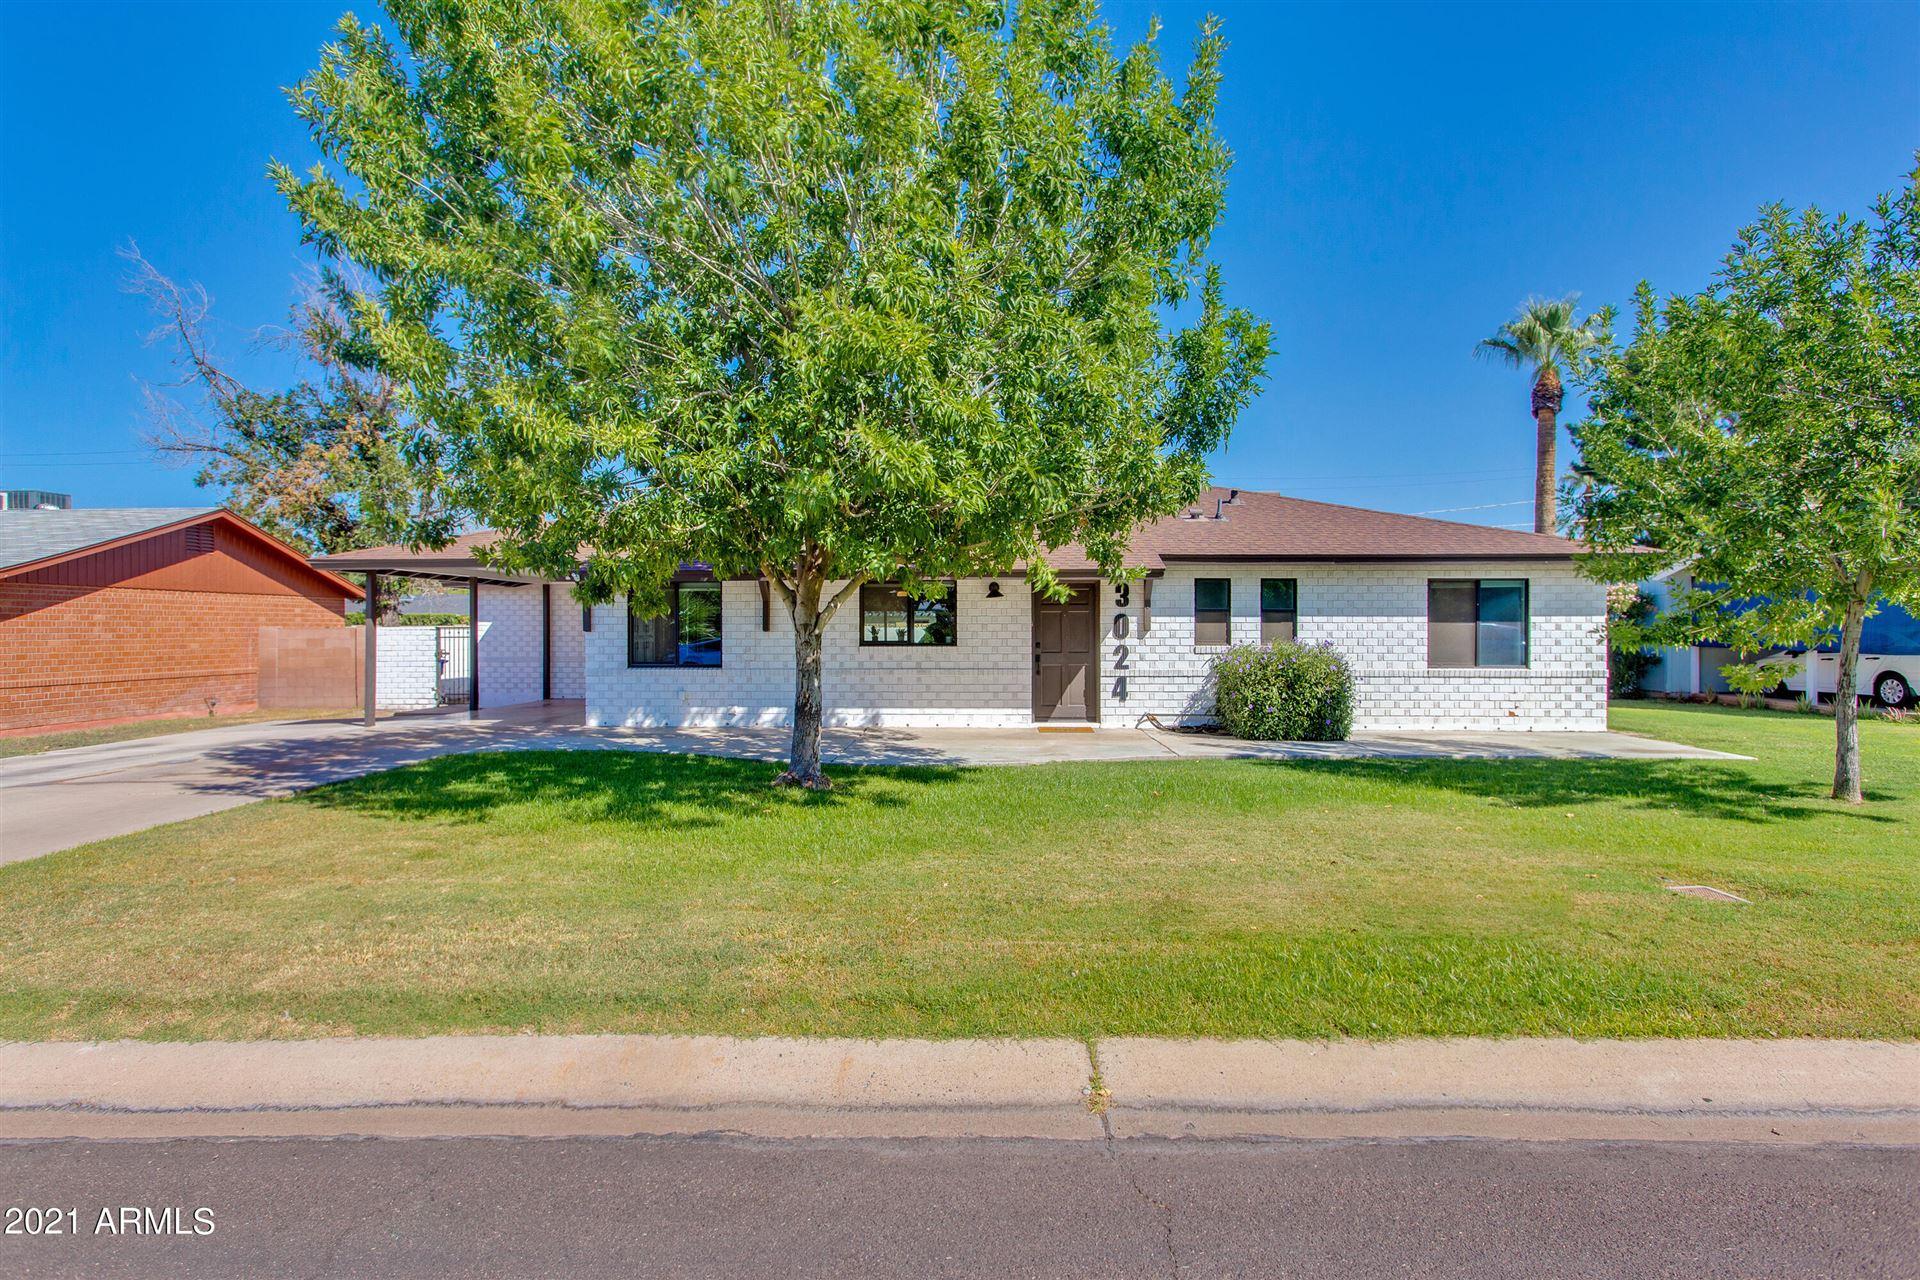 3024 E MONTECITO Avenue, Phoenix, AZ 85016 - MLS#: 6298235